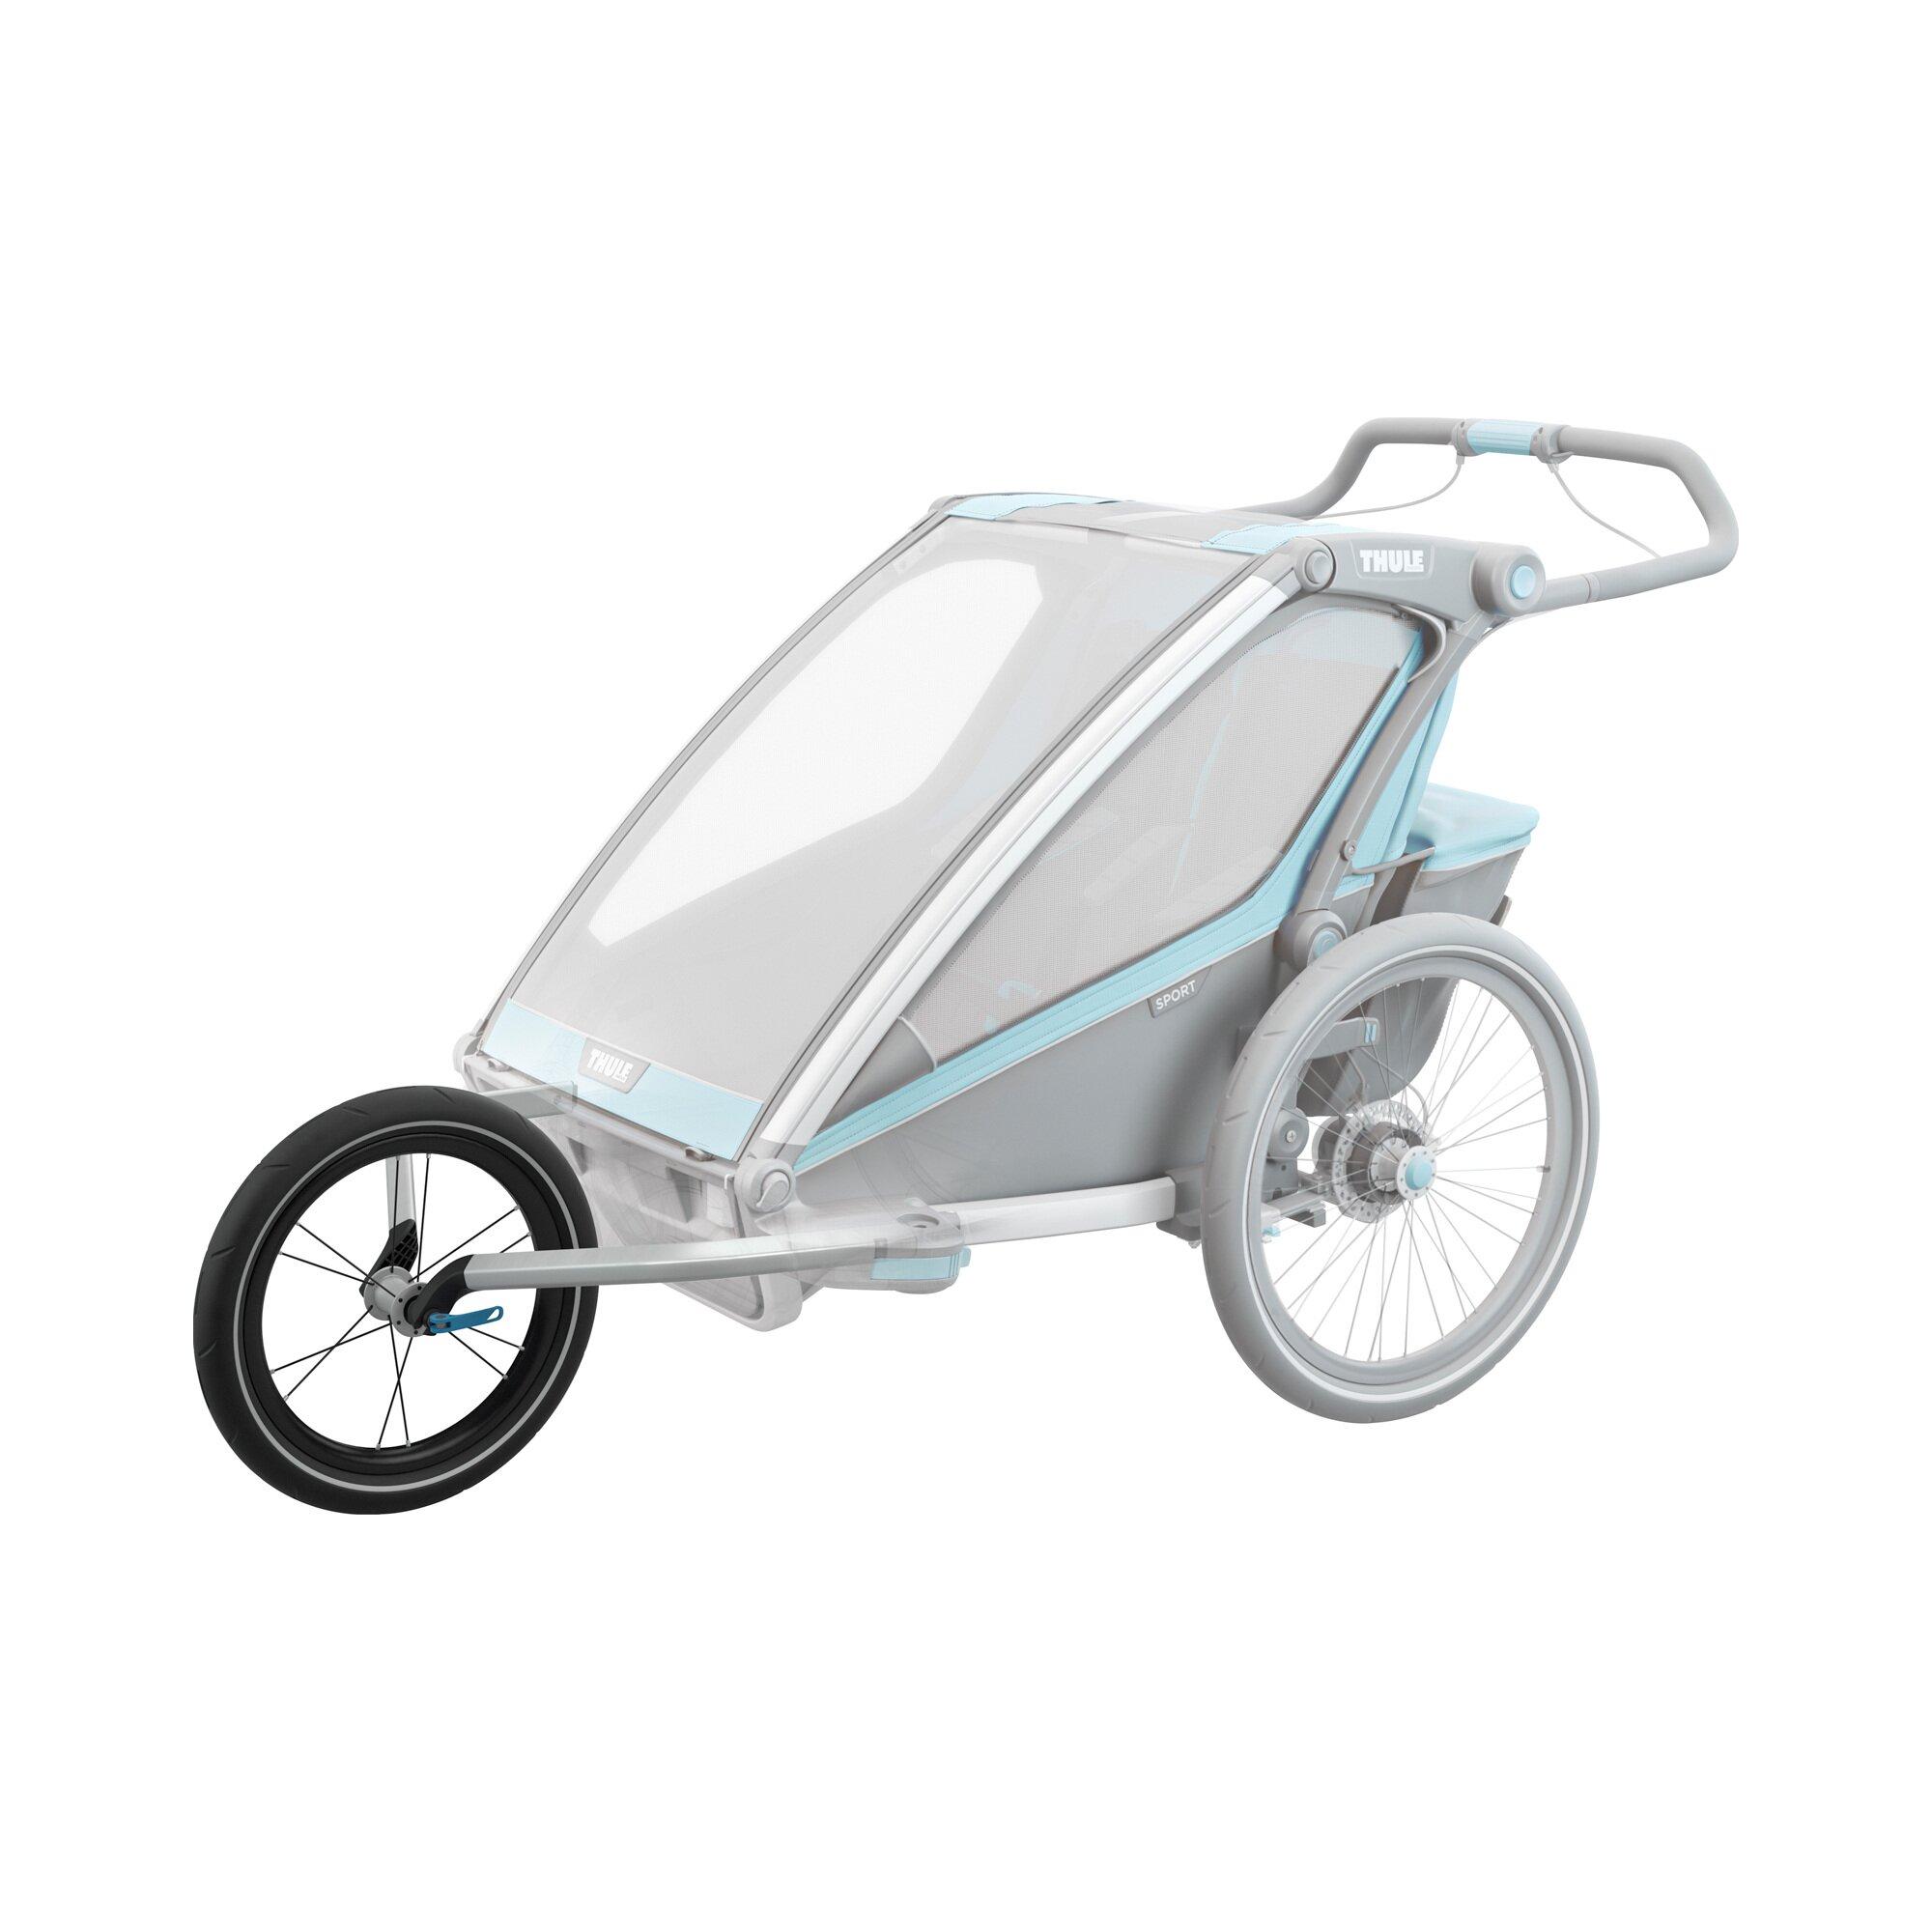 thule-jog-kit-2-fur-chariot-sport-zweisitzer